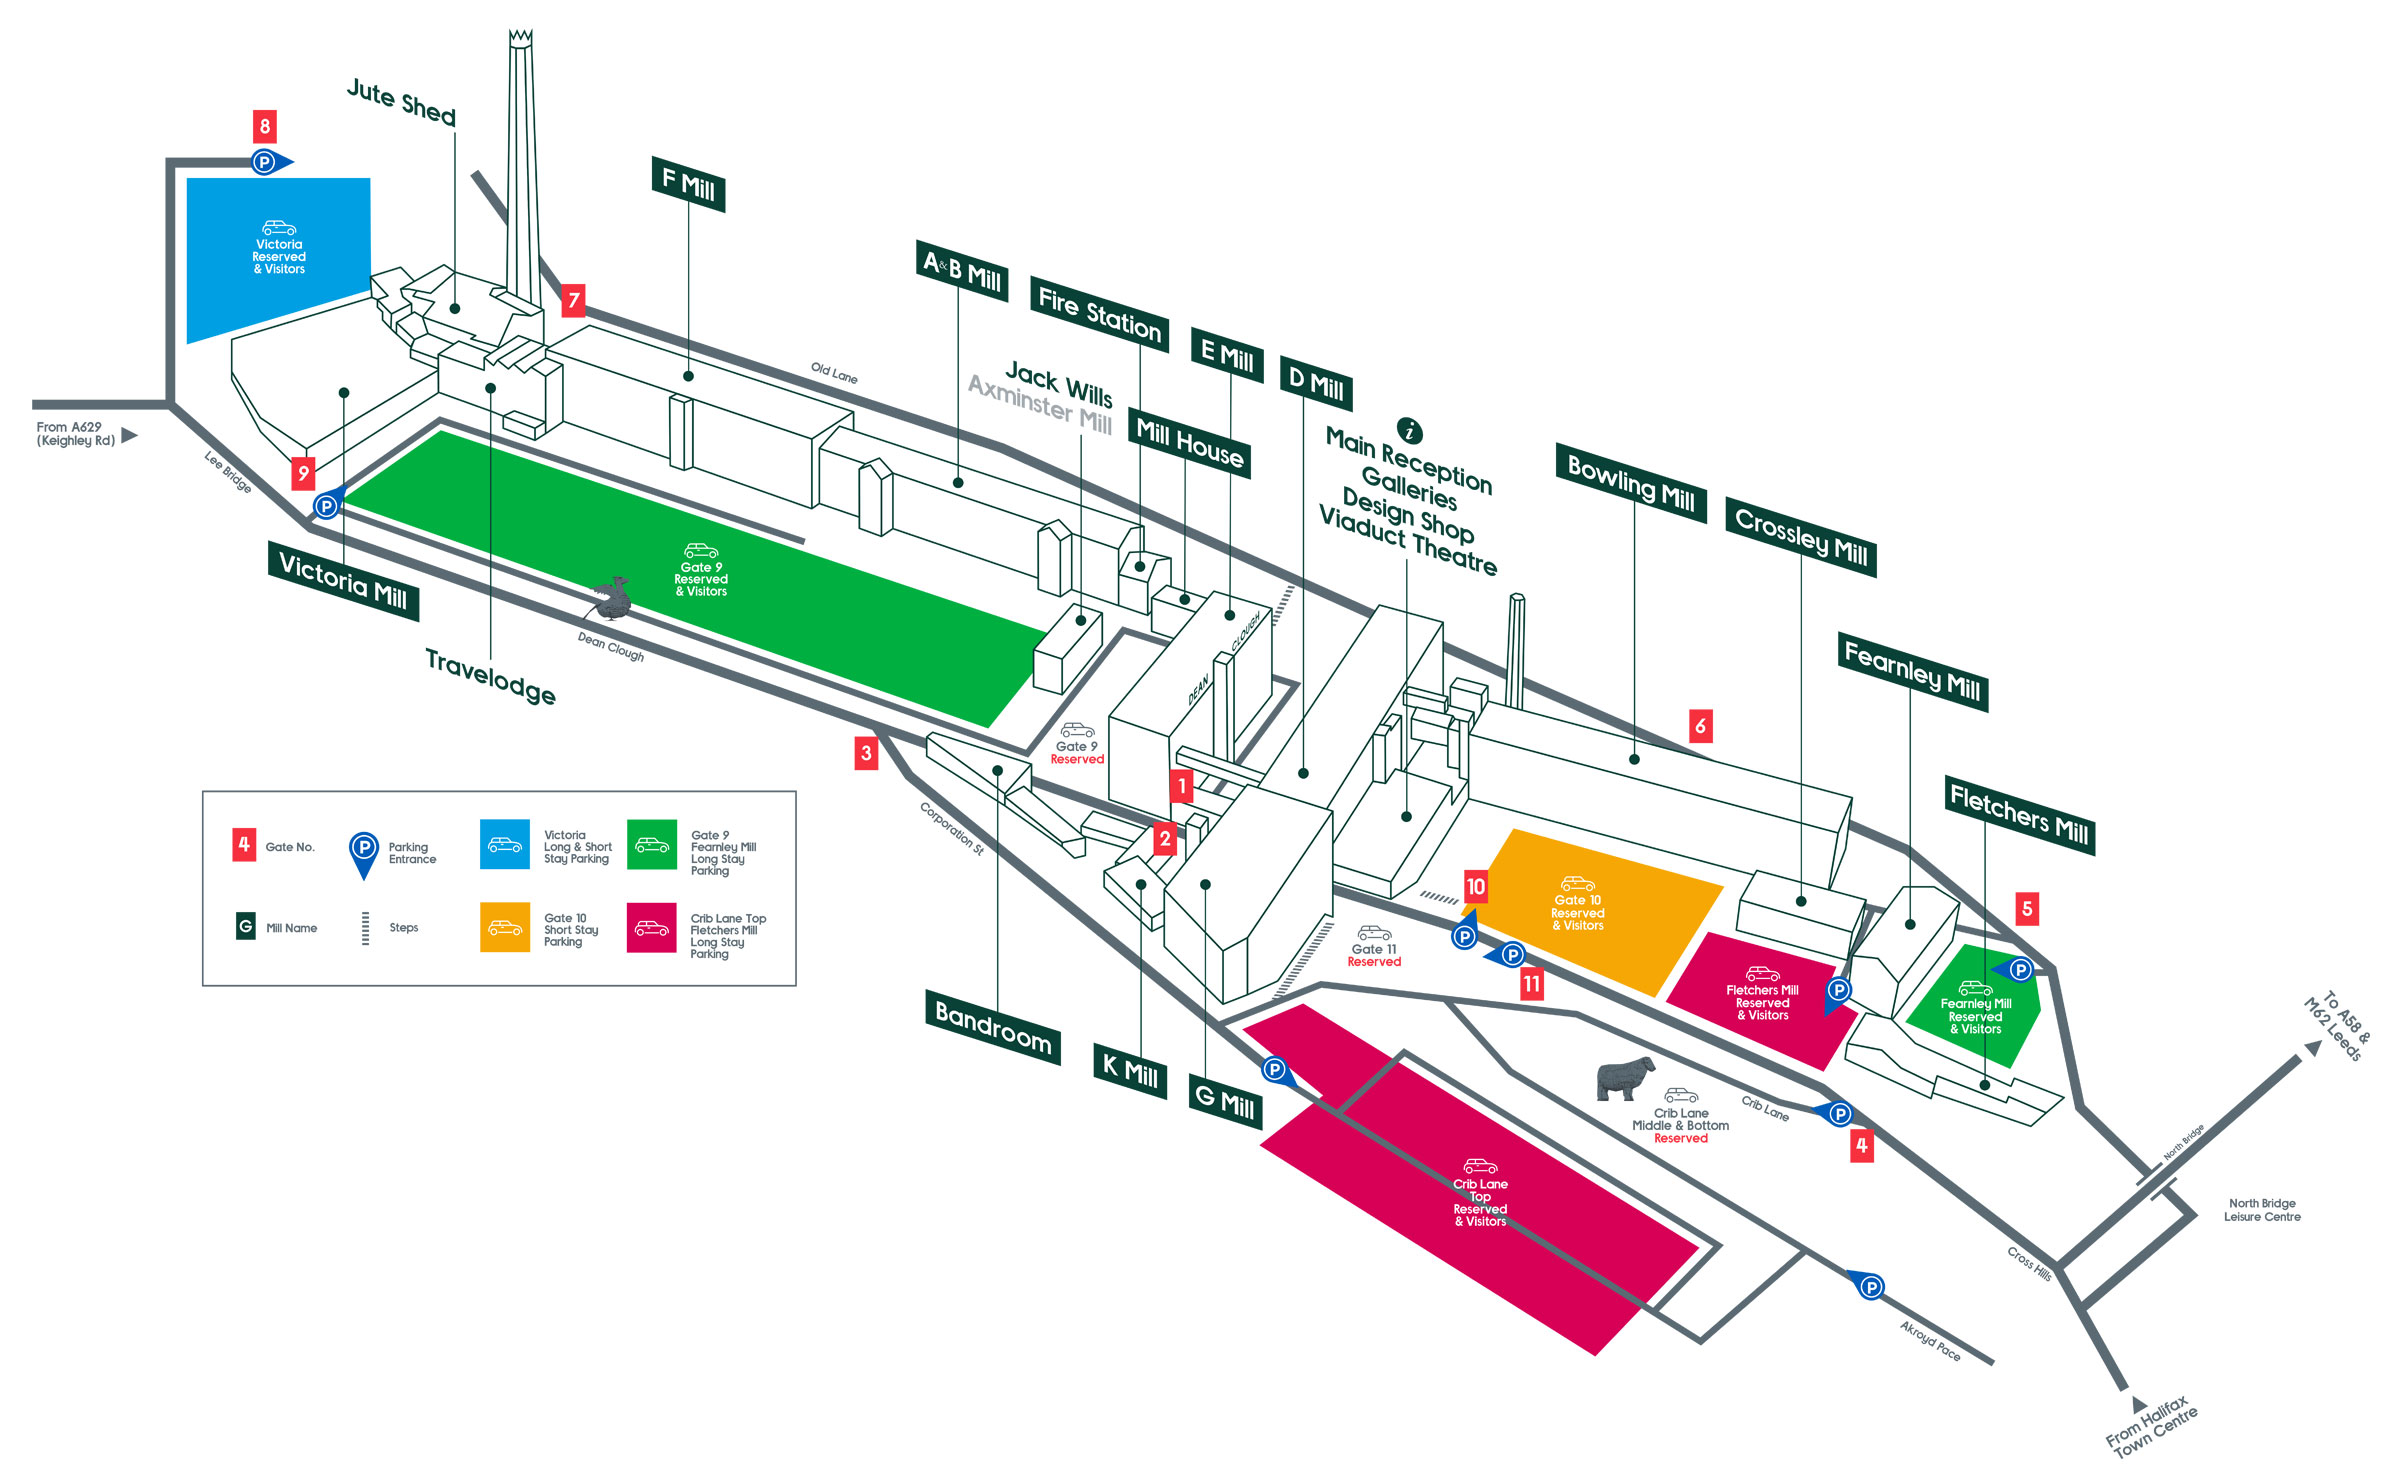 A map of parking at Dean Clough